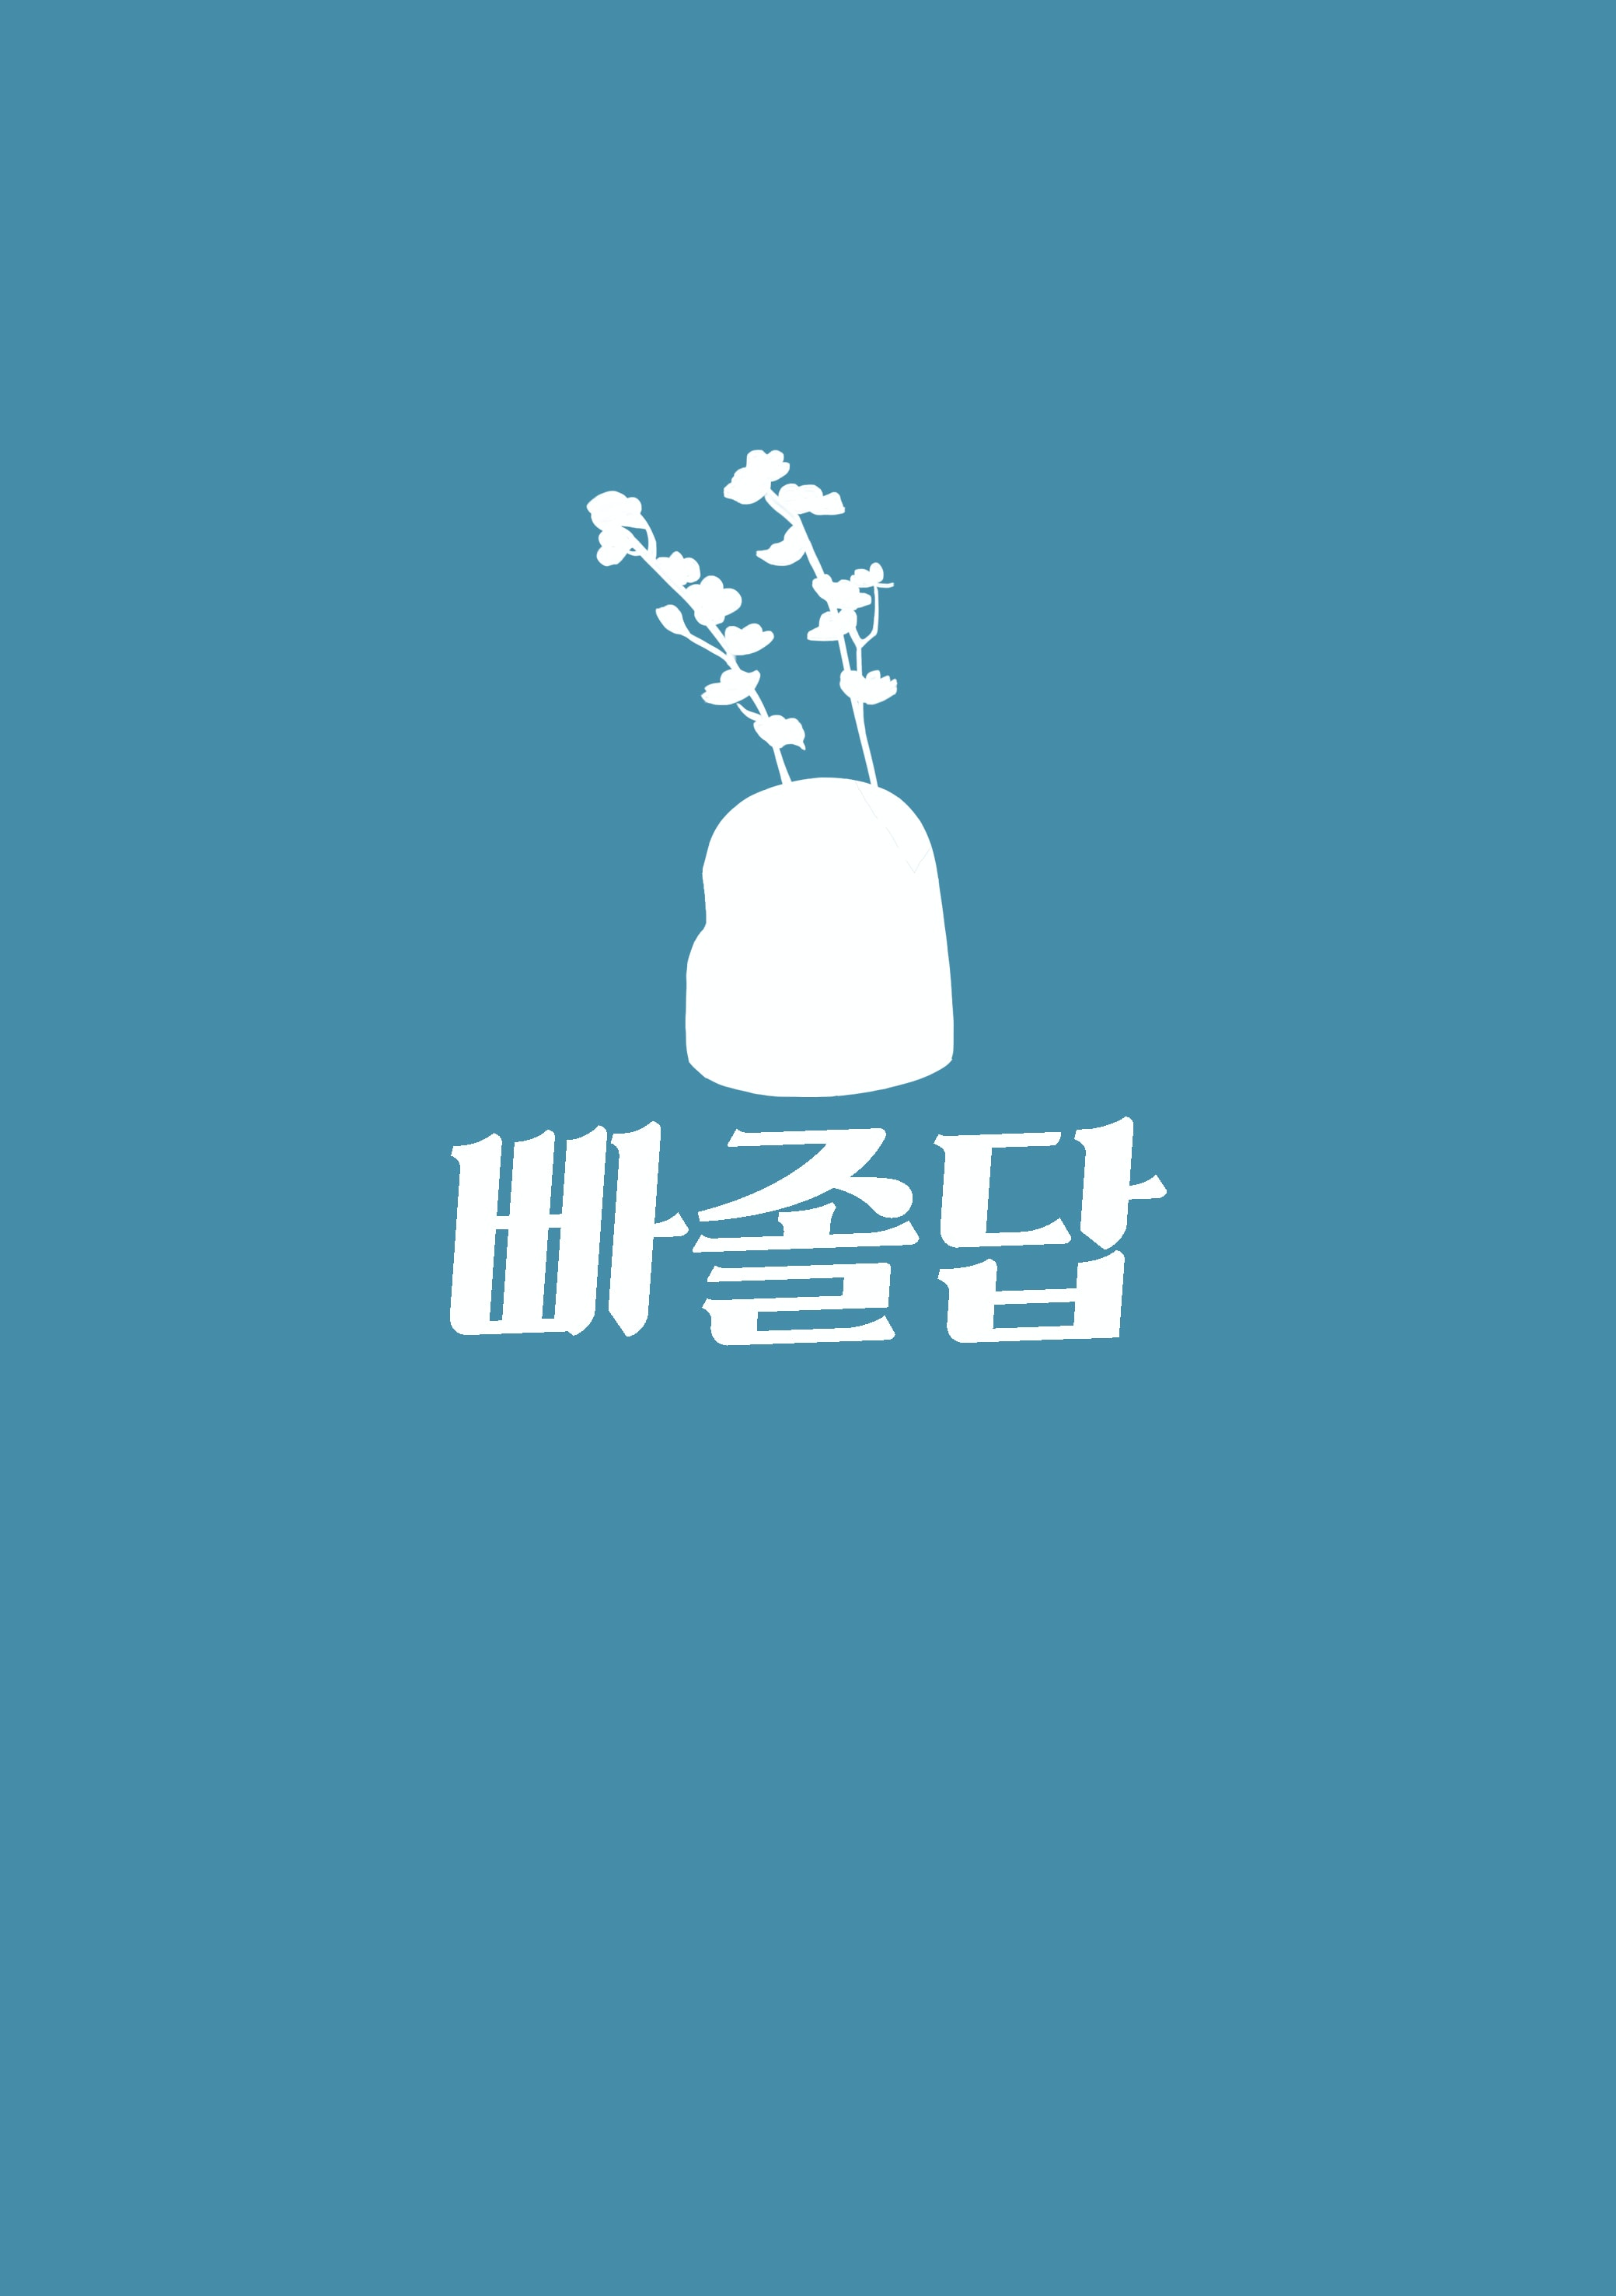 Go to Jiyeon Park's profile